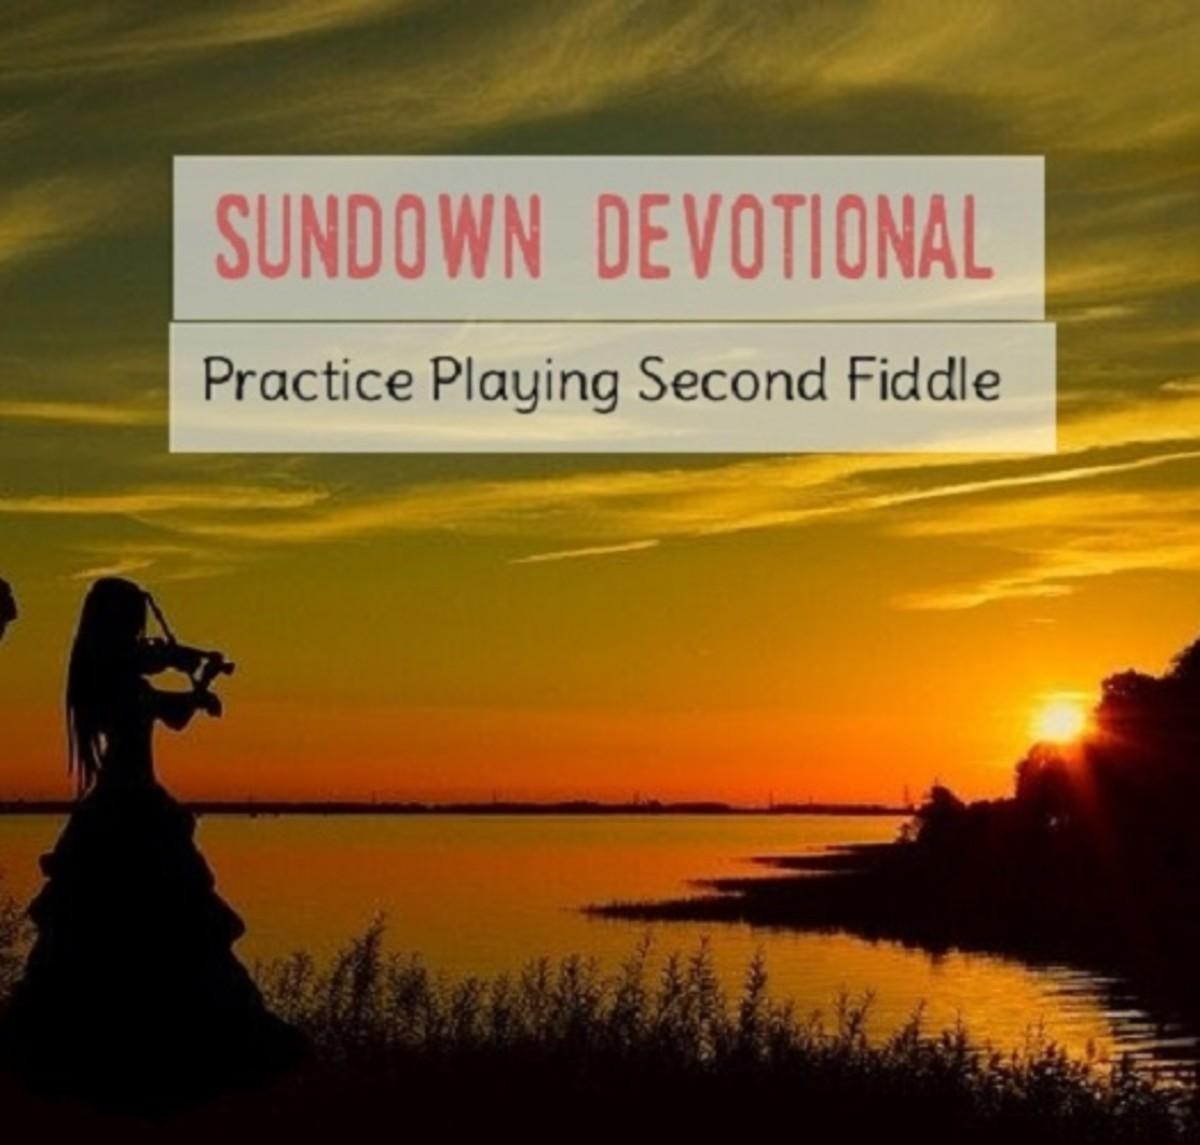 Sundown Devotional: Practice Playing Second Fiddle